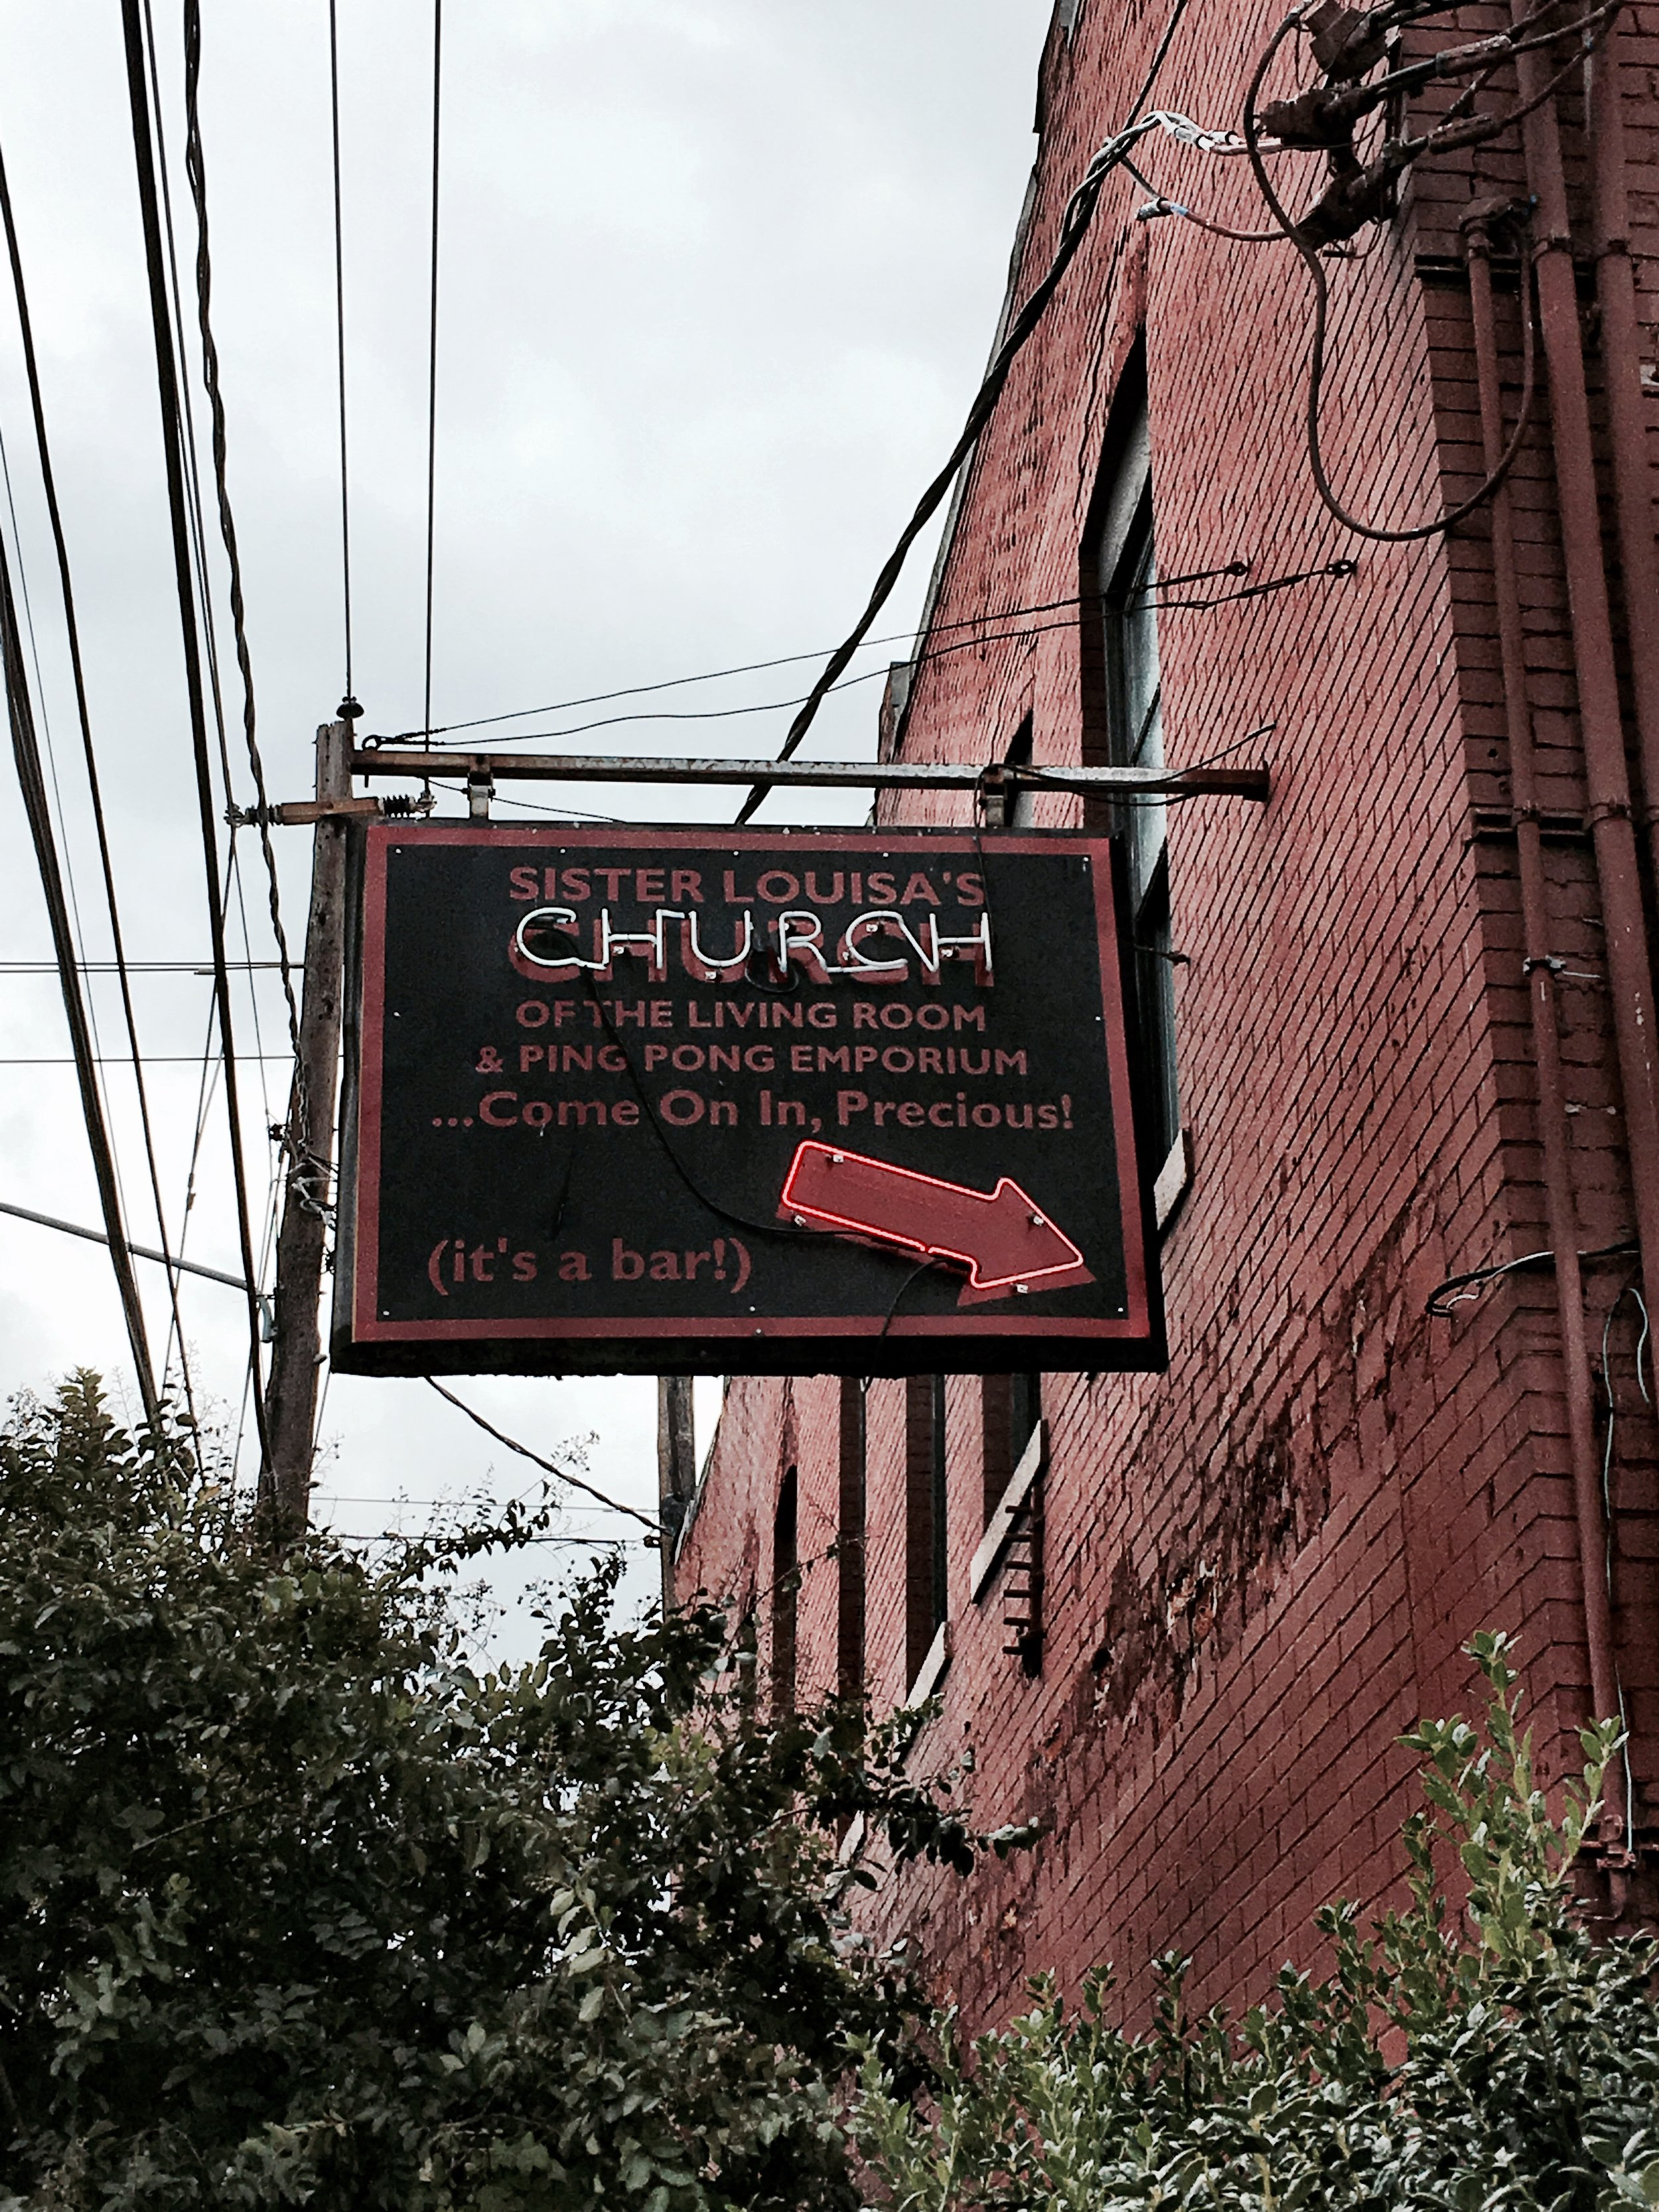 Sweet Auburn Sister Louise Church.jpg